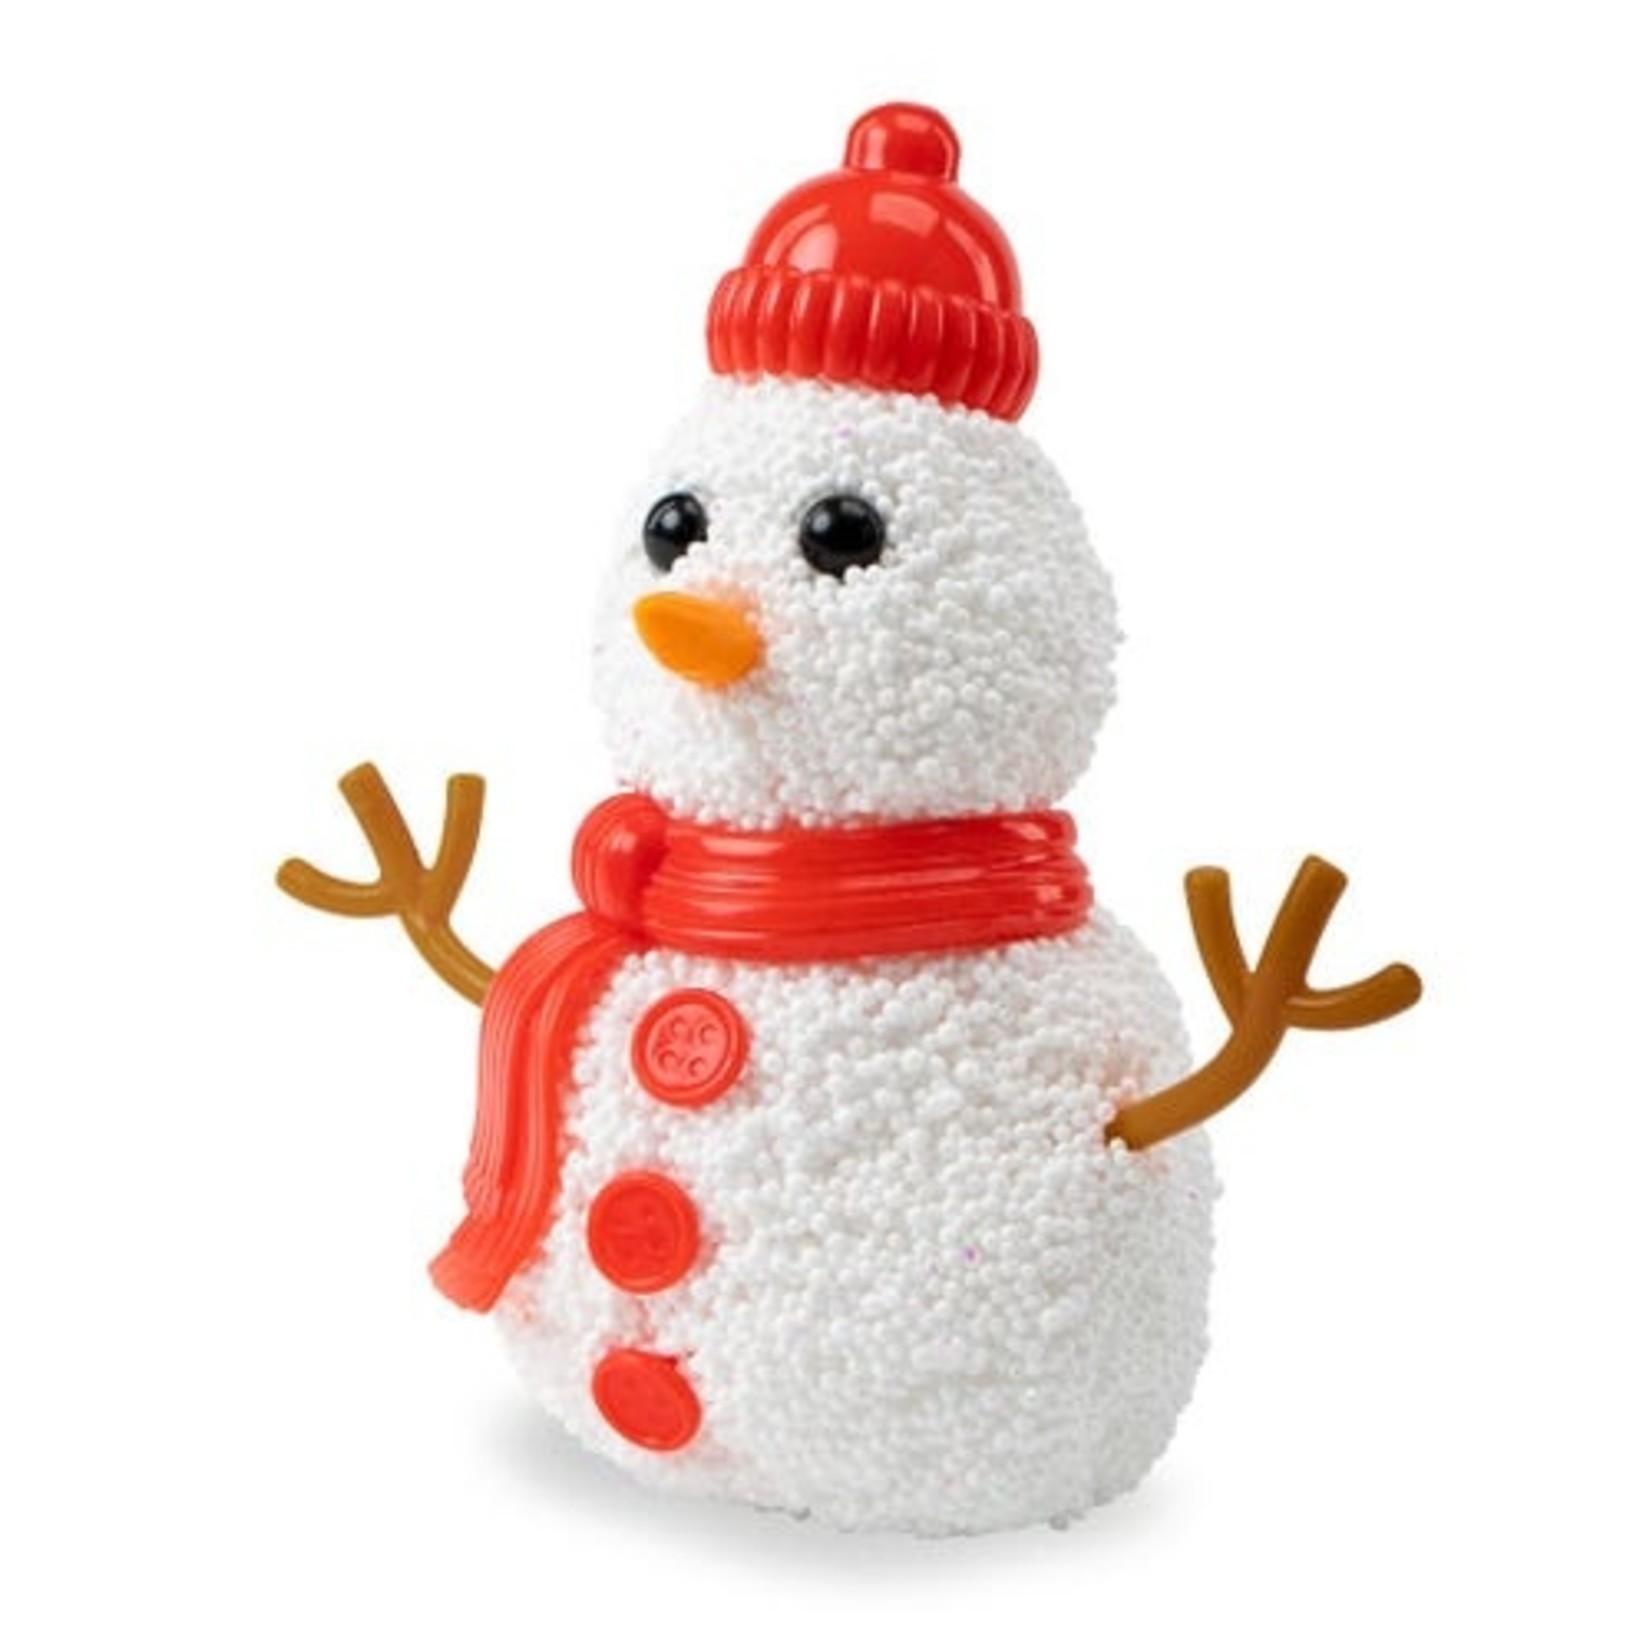 Educational Insights Playfoam Build-A-Snowman